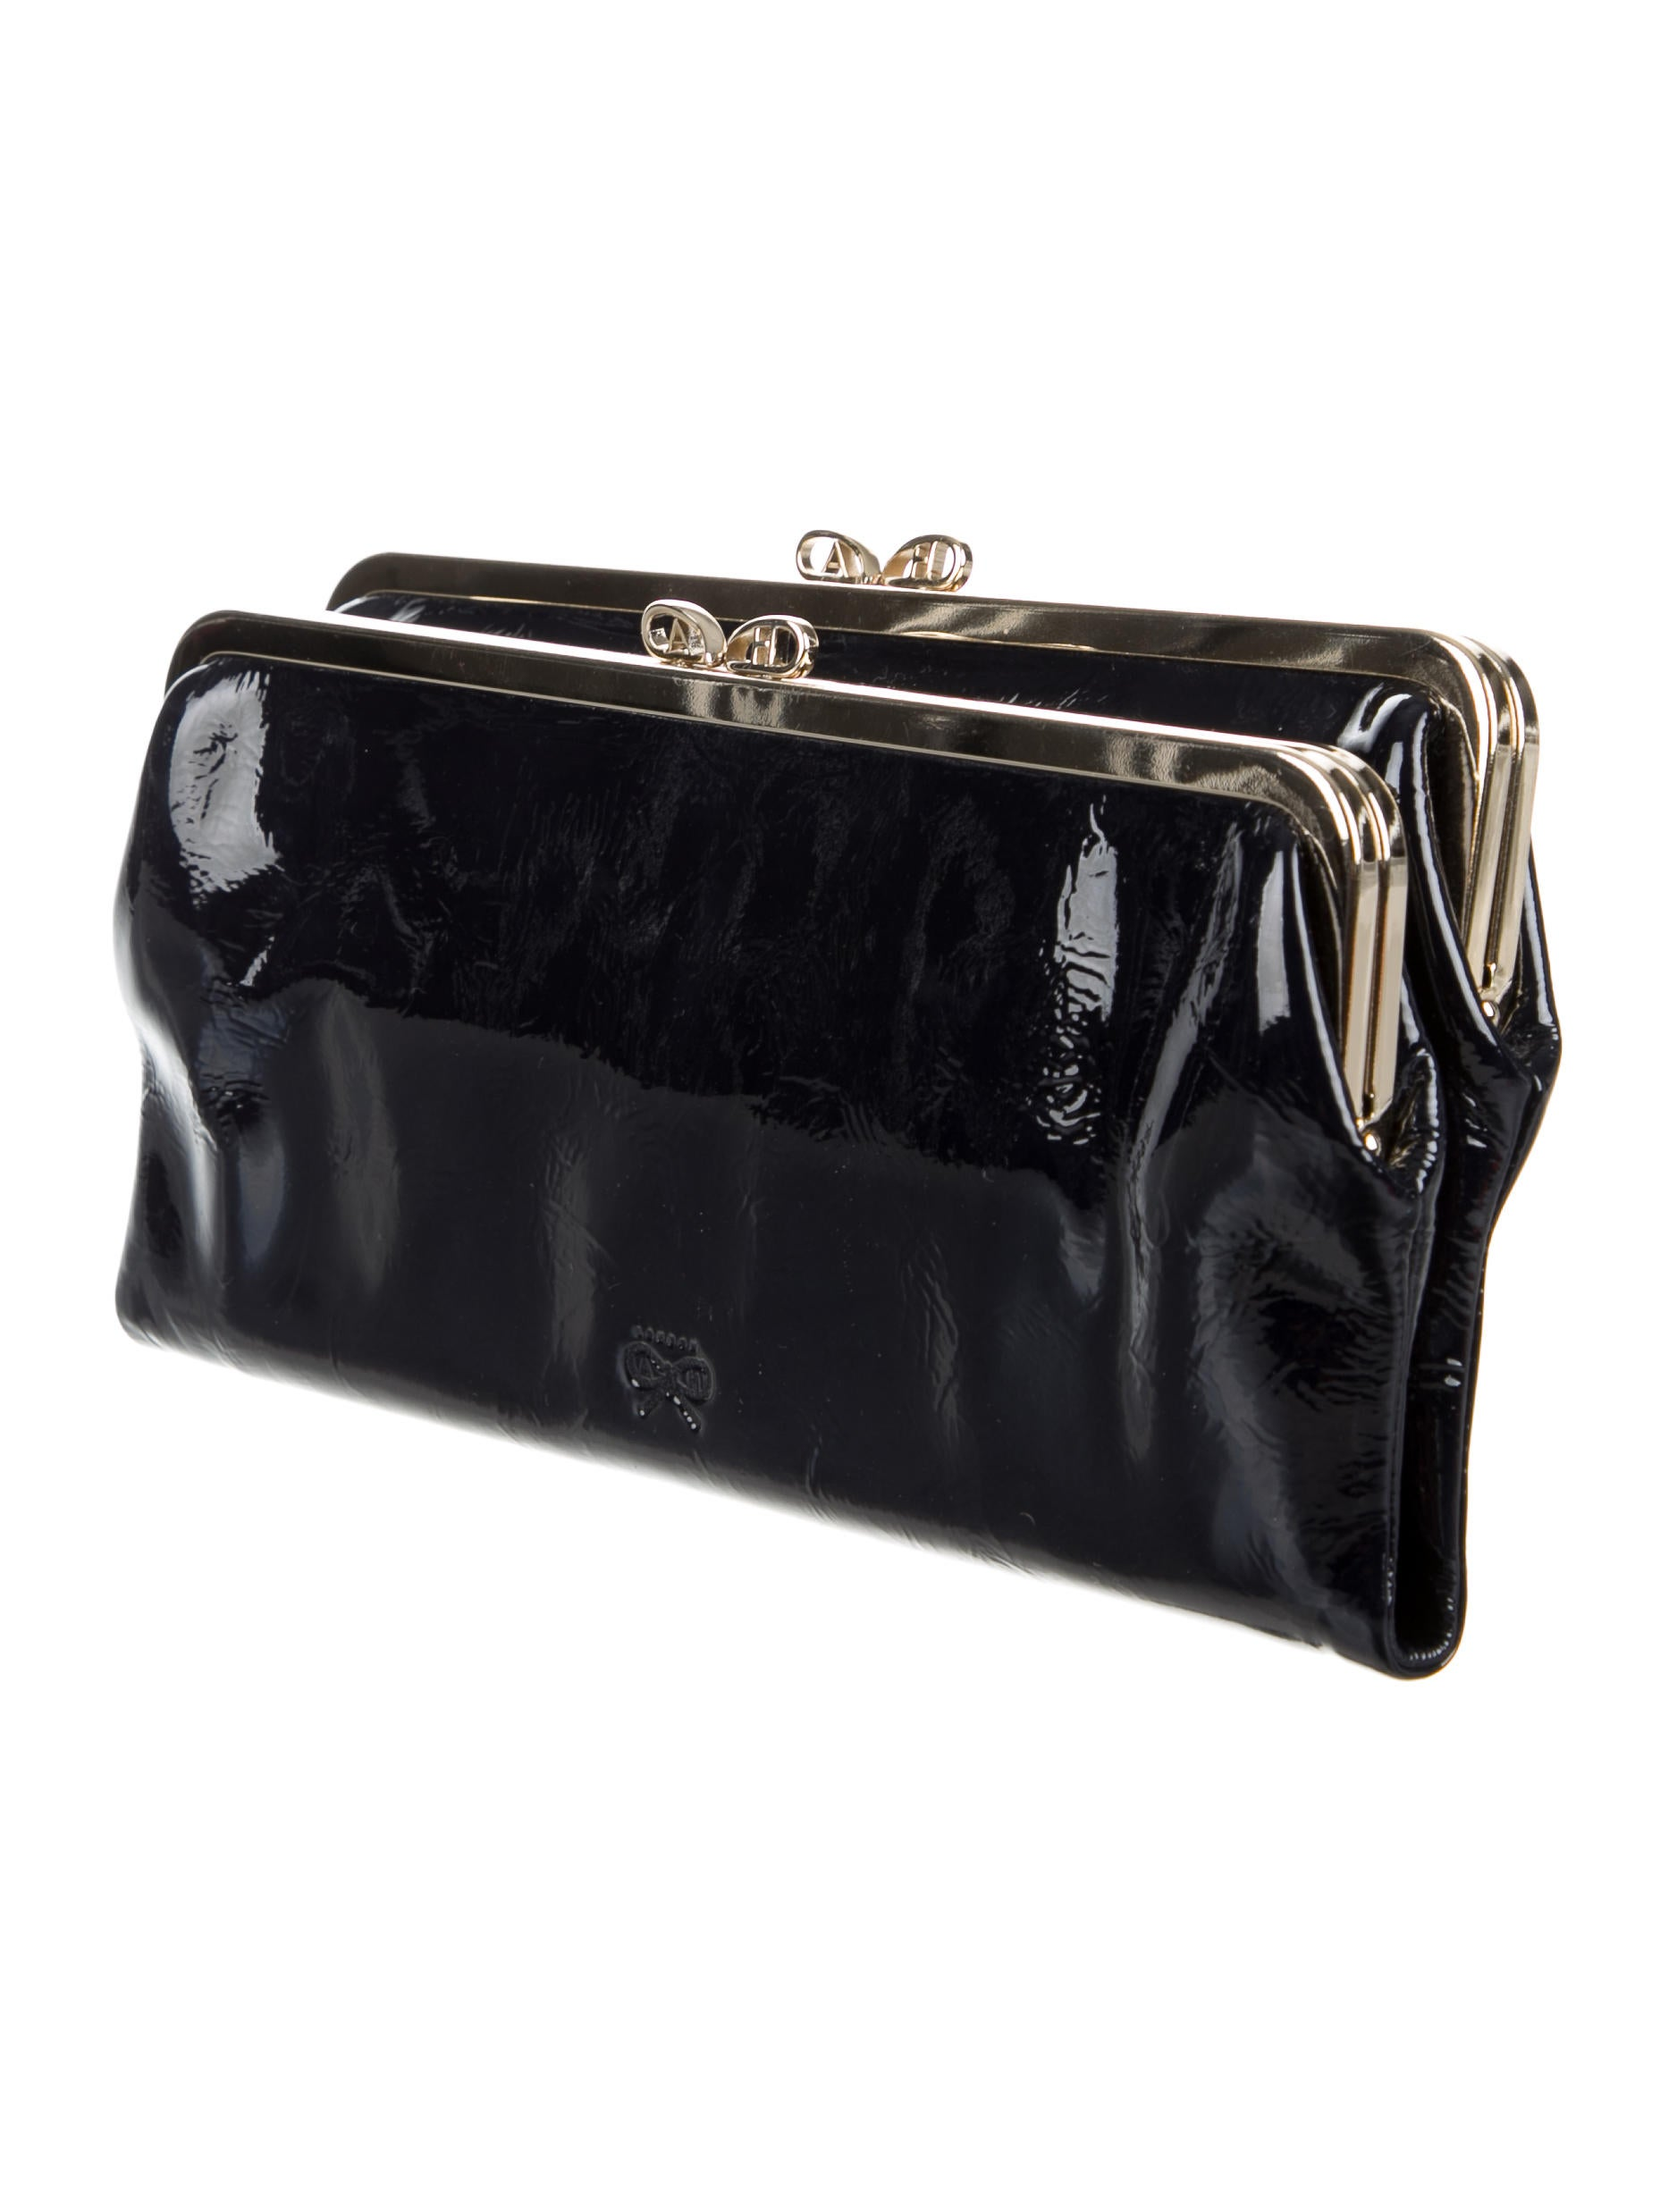 Anya Hindmarch Patent Luce Clutch - Handbags